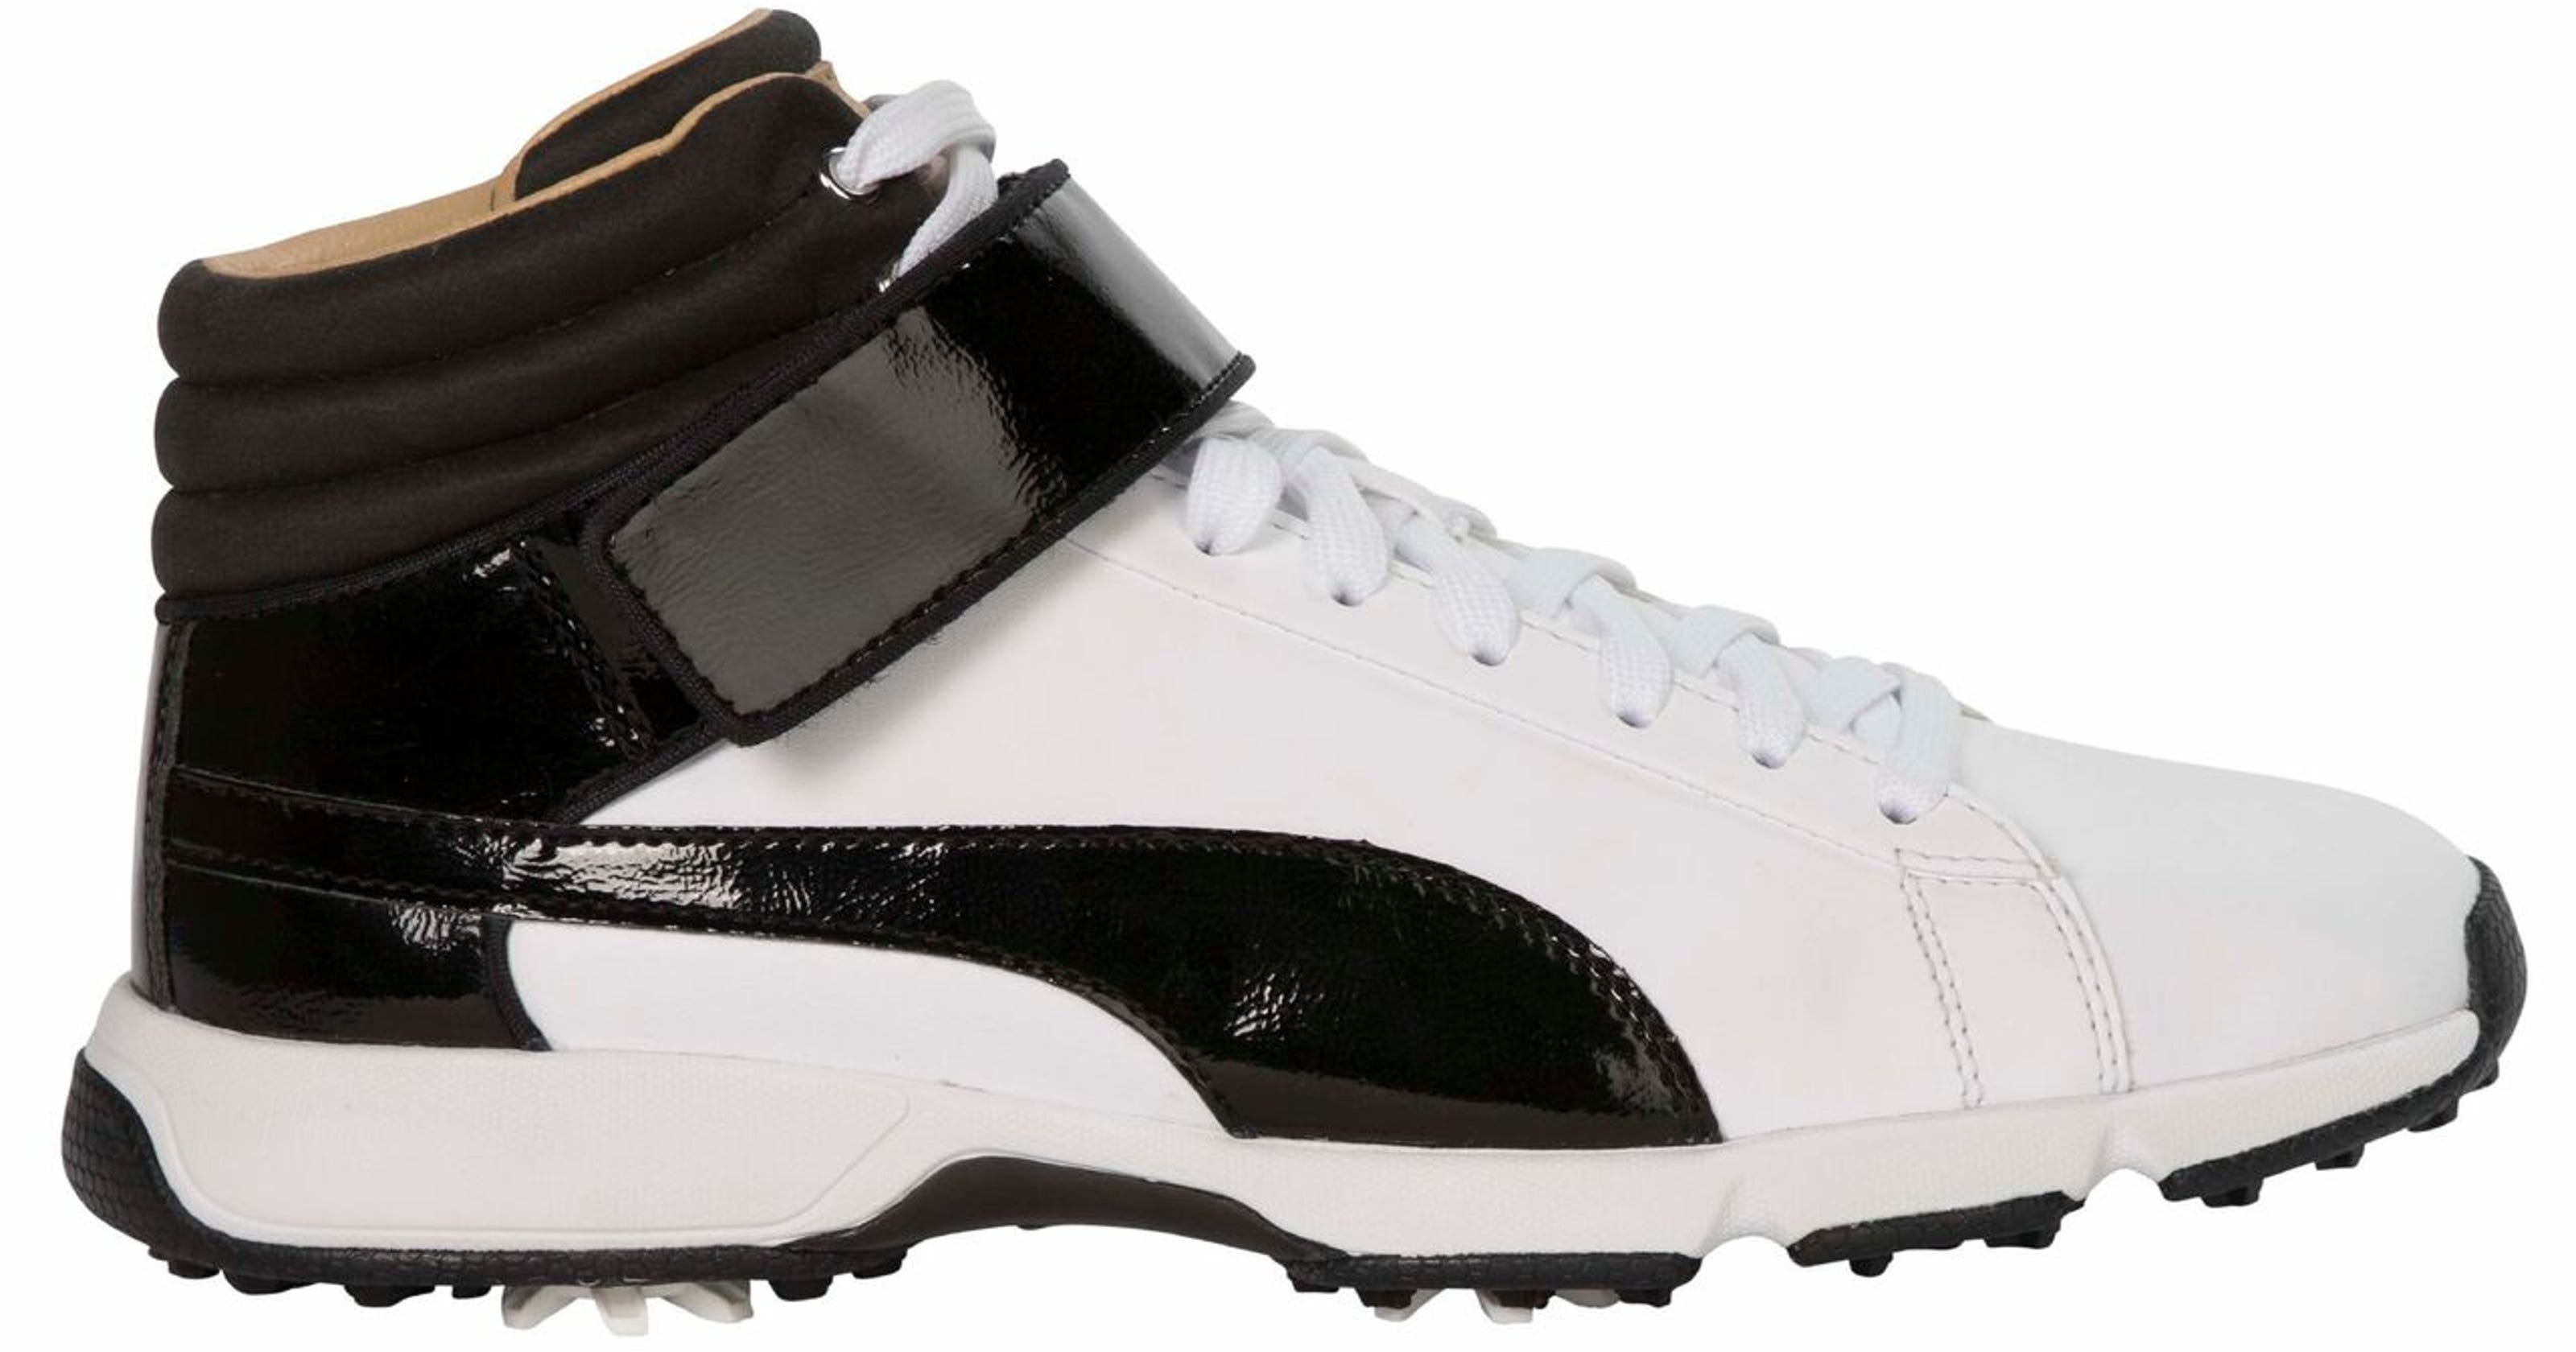 785f8277fdd9 Golf Gear  Puma high-top golf shoes designed for juniors